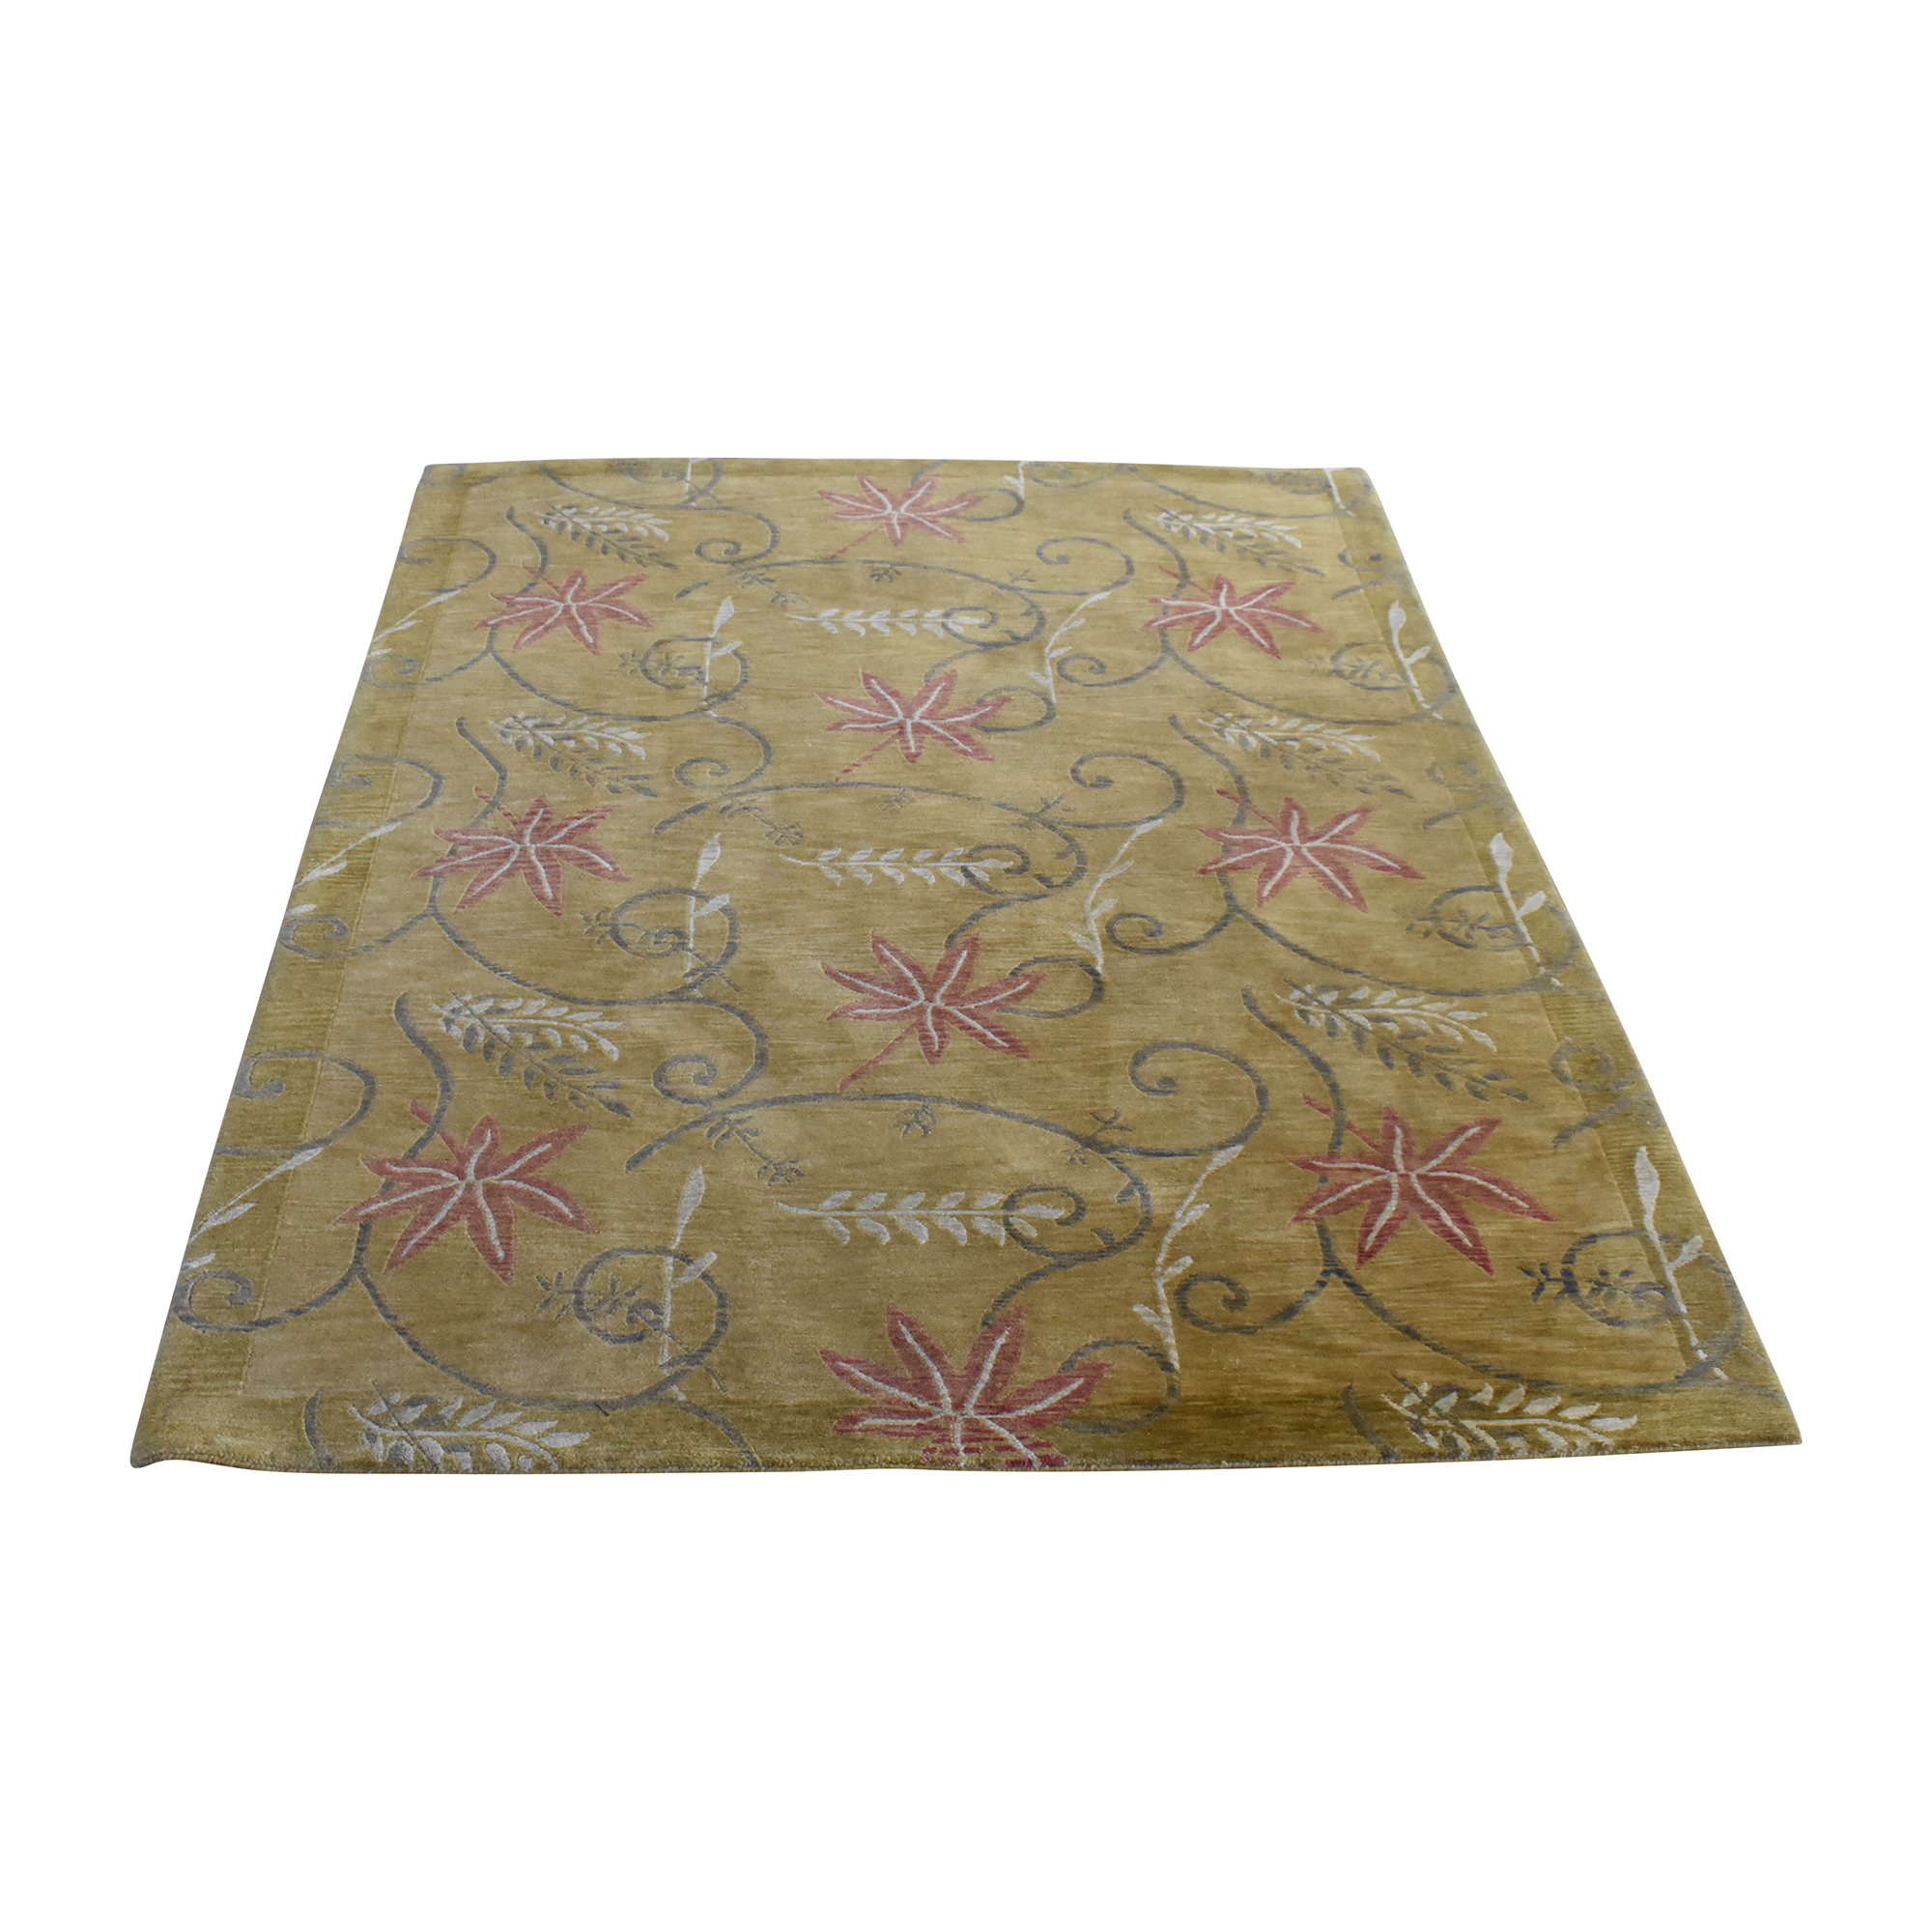 Stark Carpet Custom Area Rug / Decor